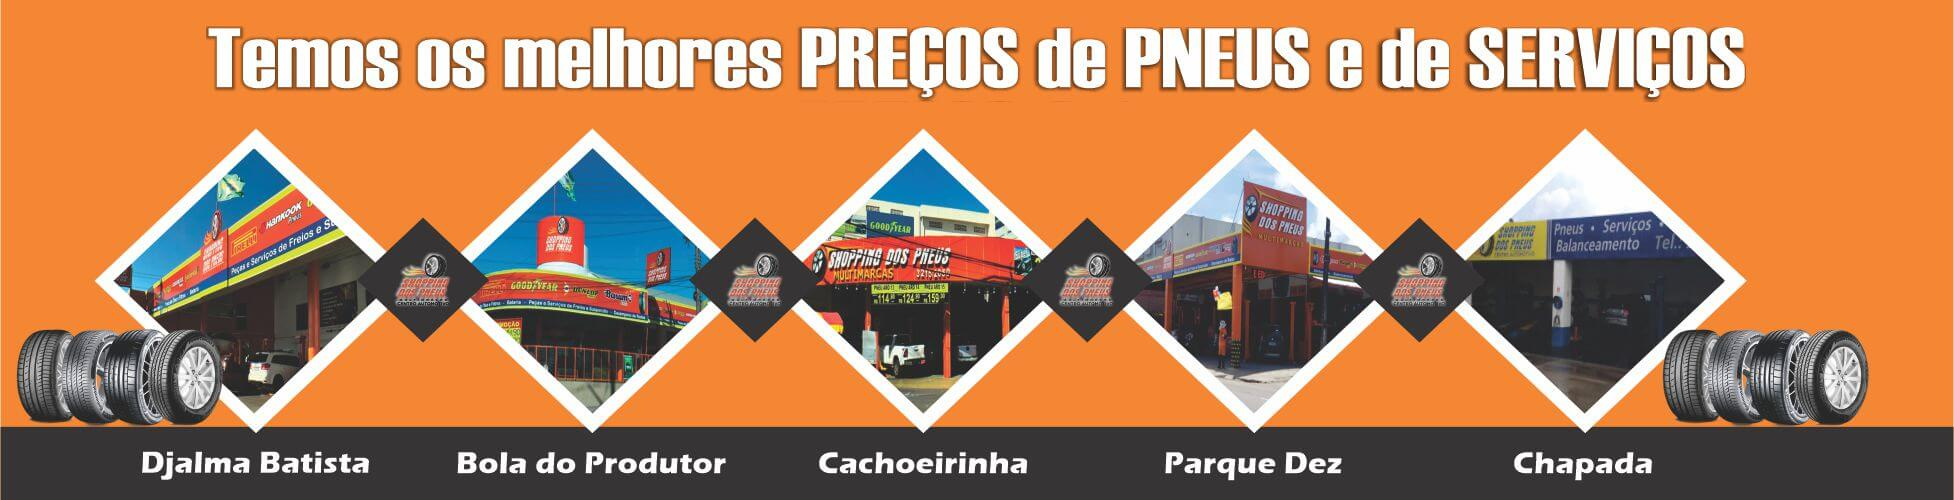 banner-lojas-SHOPPING-DOS-PNEUS